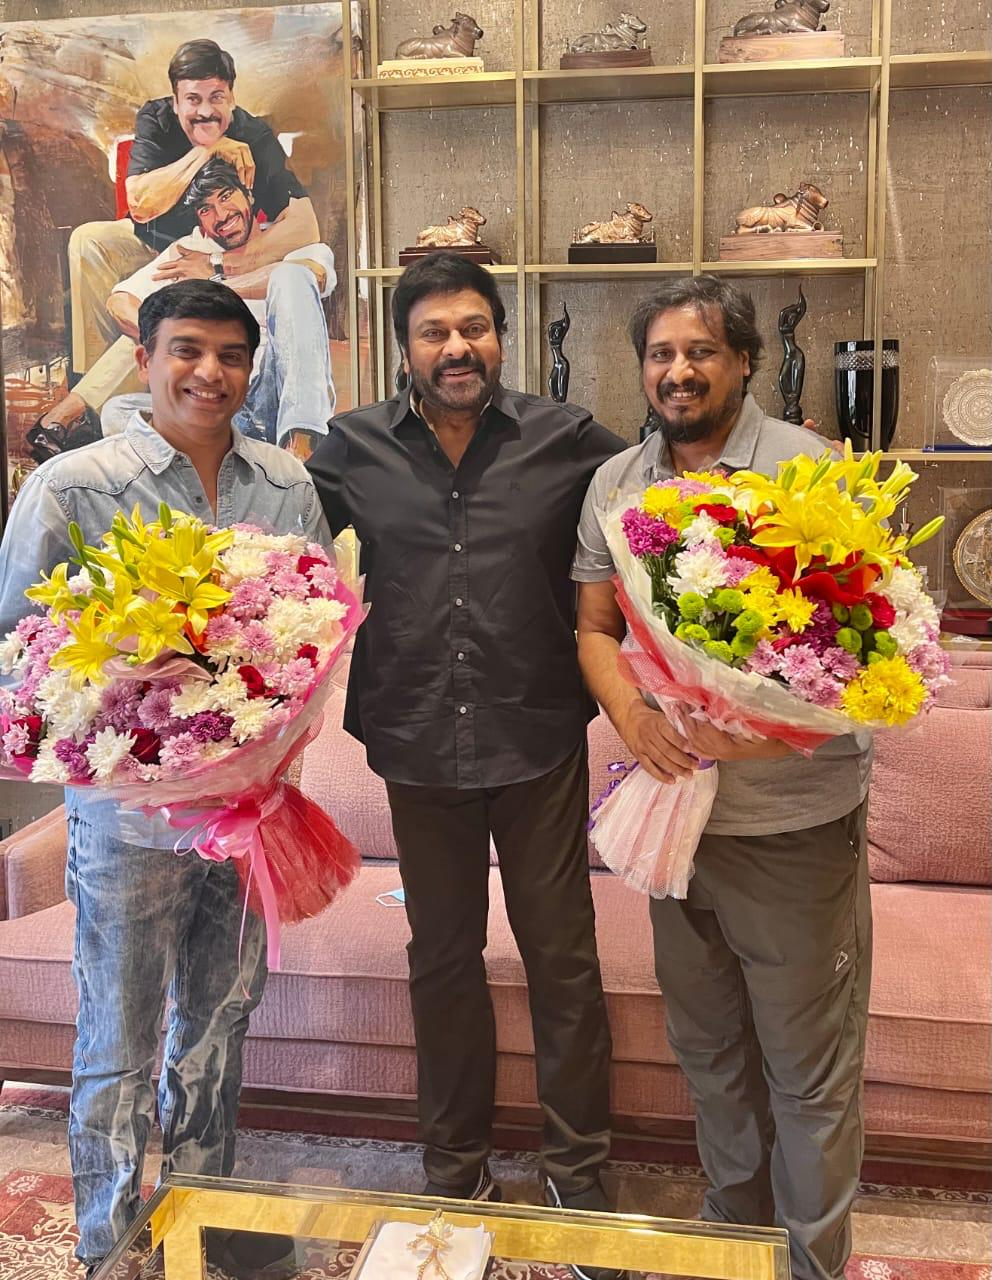 Chiru Congratulates 'vakeel Saab' Dil Raju And Director Sriram Venu